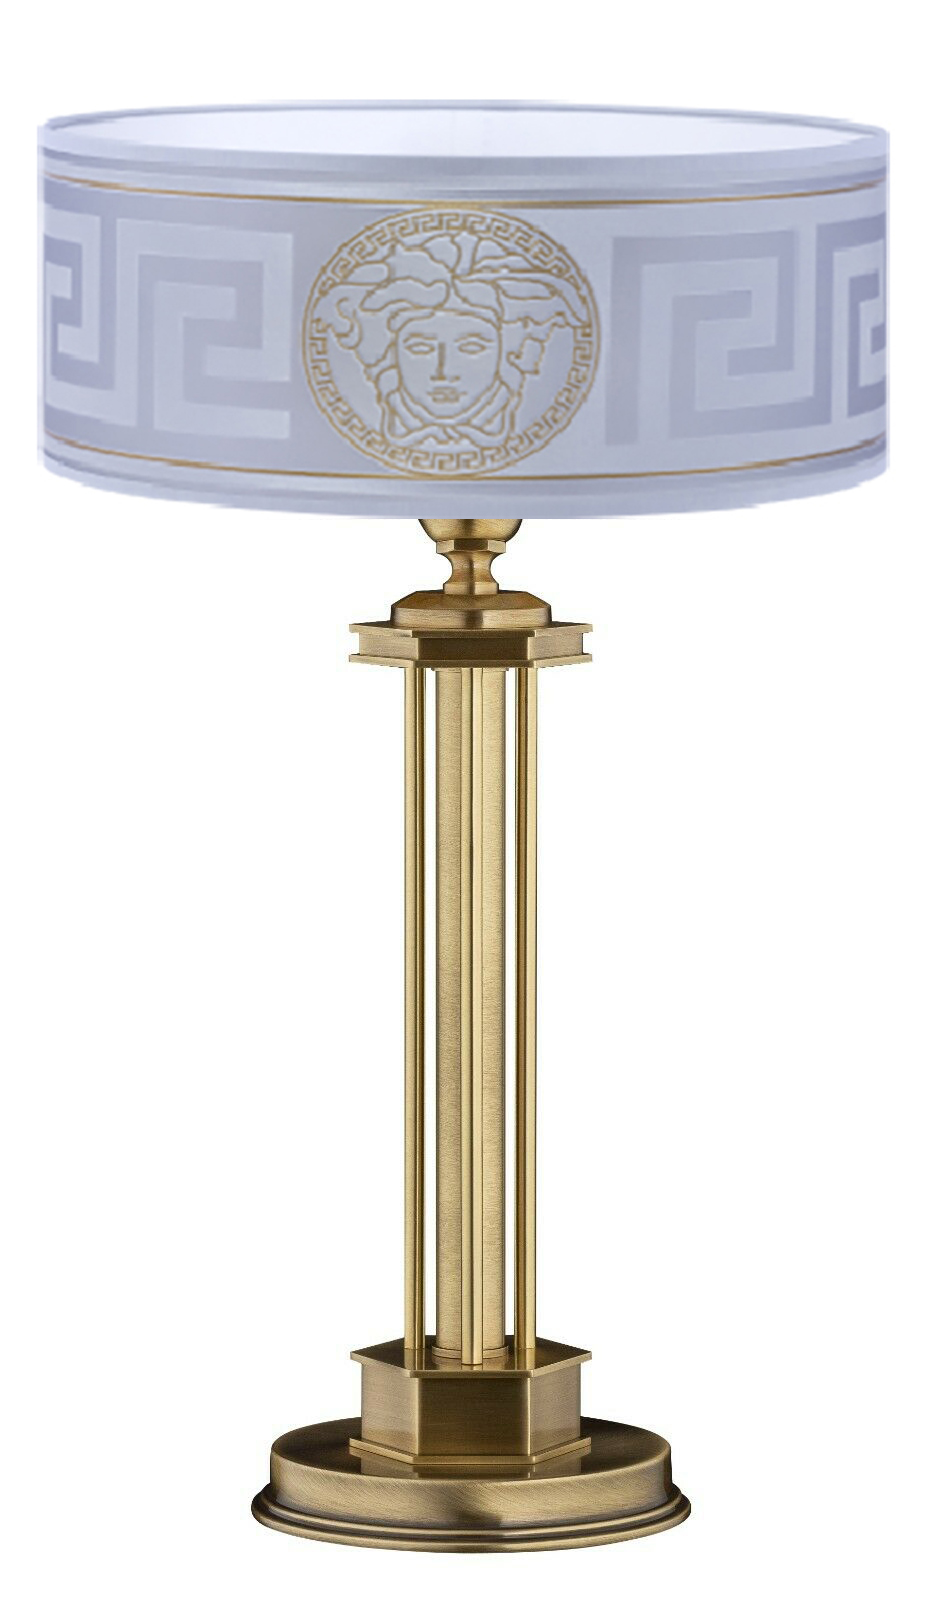 Luxury Bedside Table Lamps Decor Versace Shade Luxury Chandelier